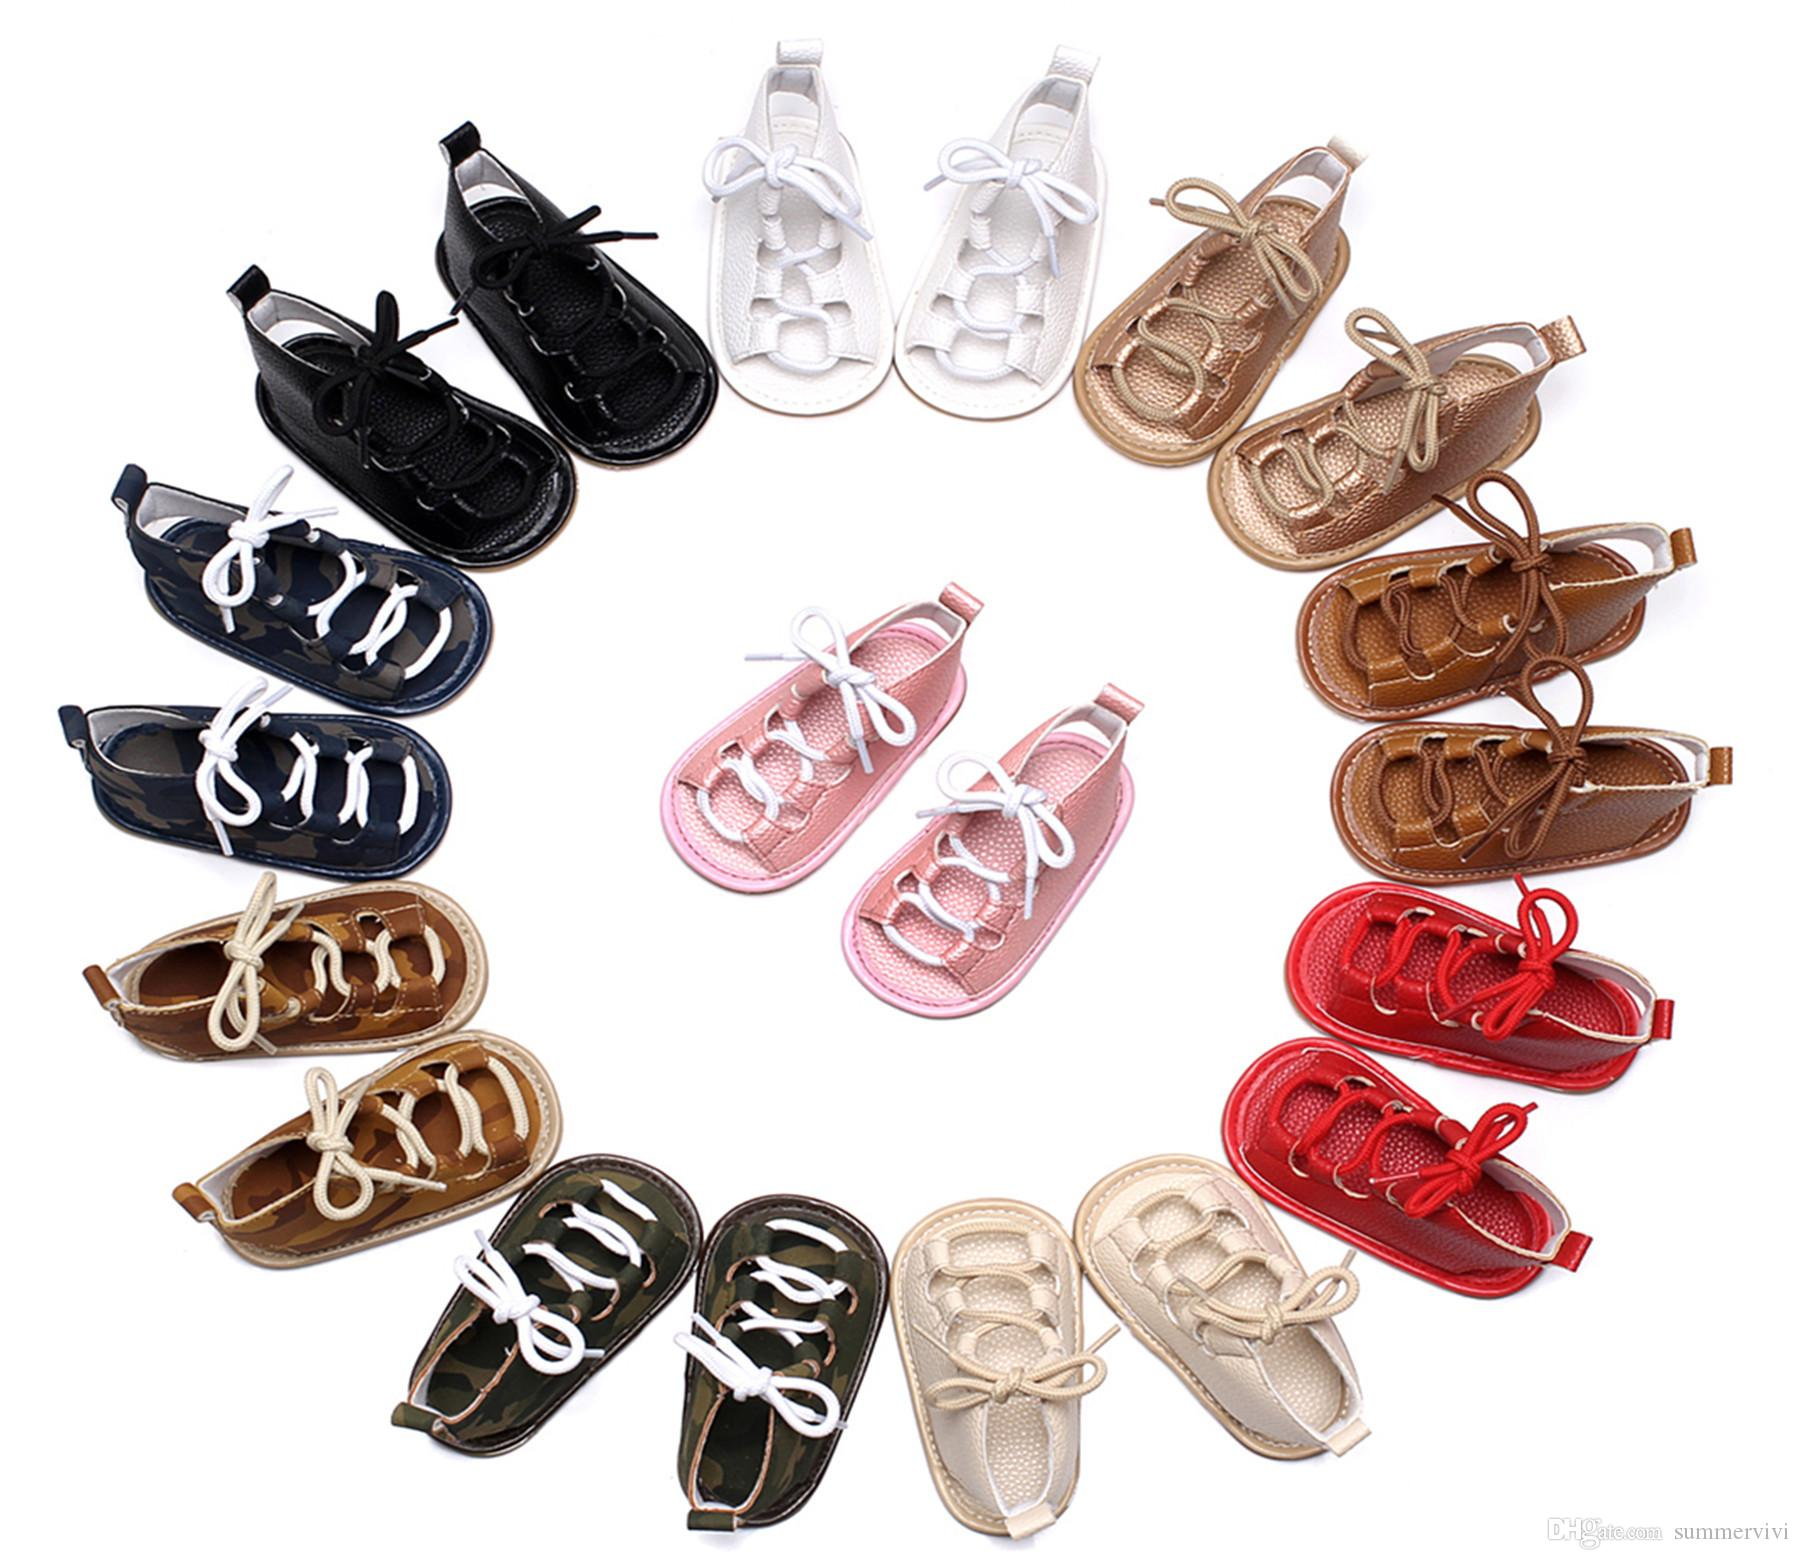 Girls sandals - Baby Girls Sandals Toddler Kids Flat Heels Lace Up Sandals Girls Rome Sandals Baby High